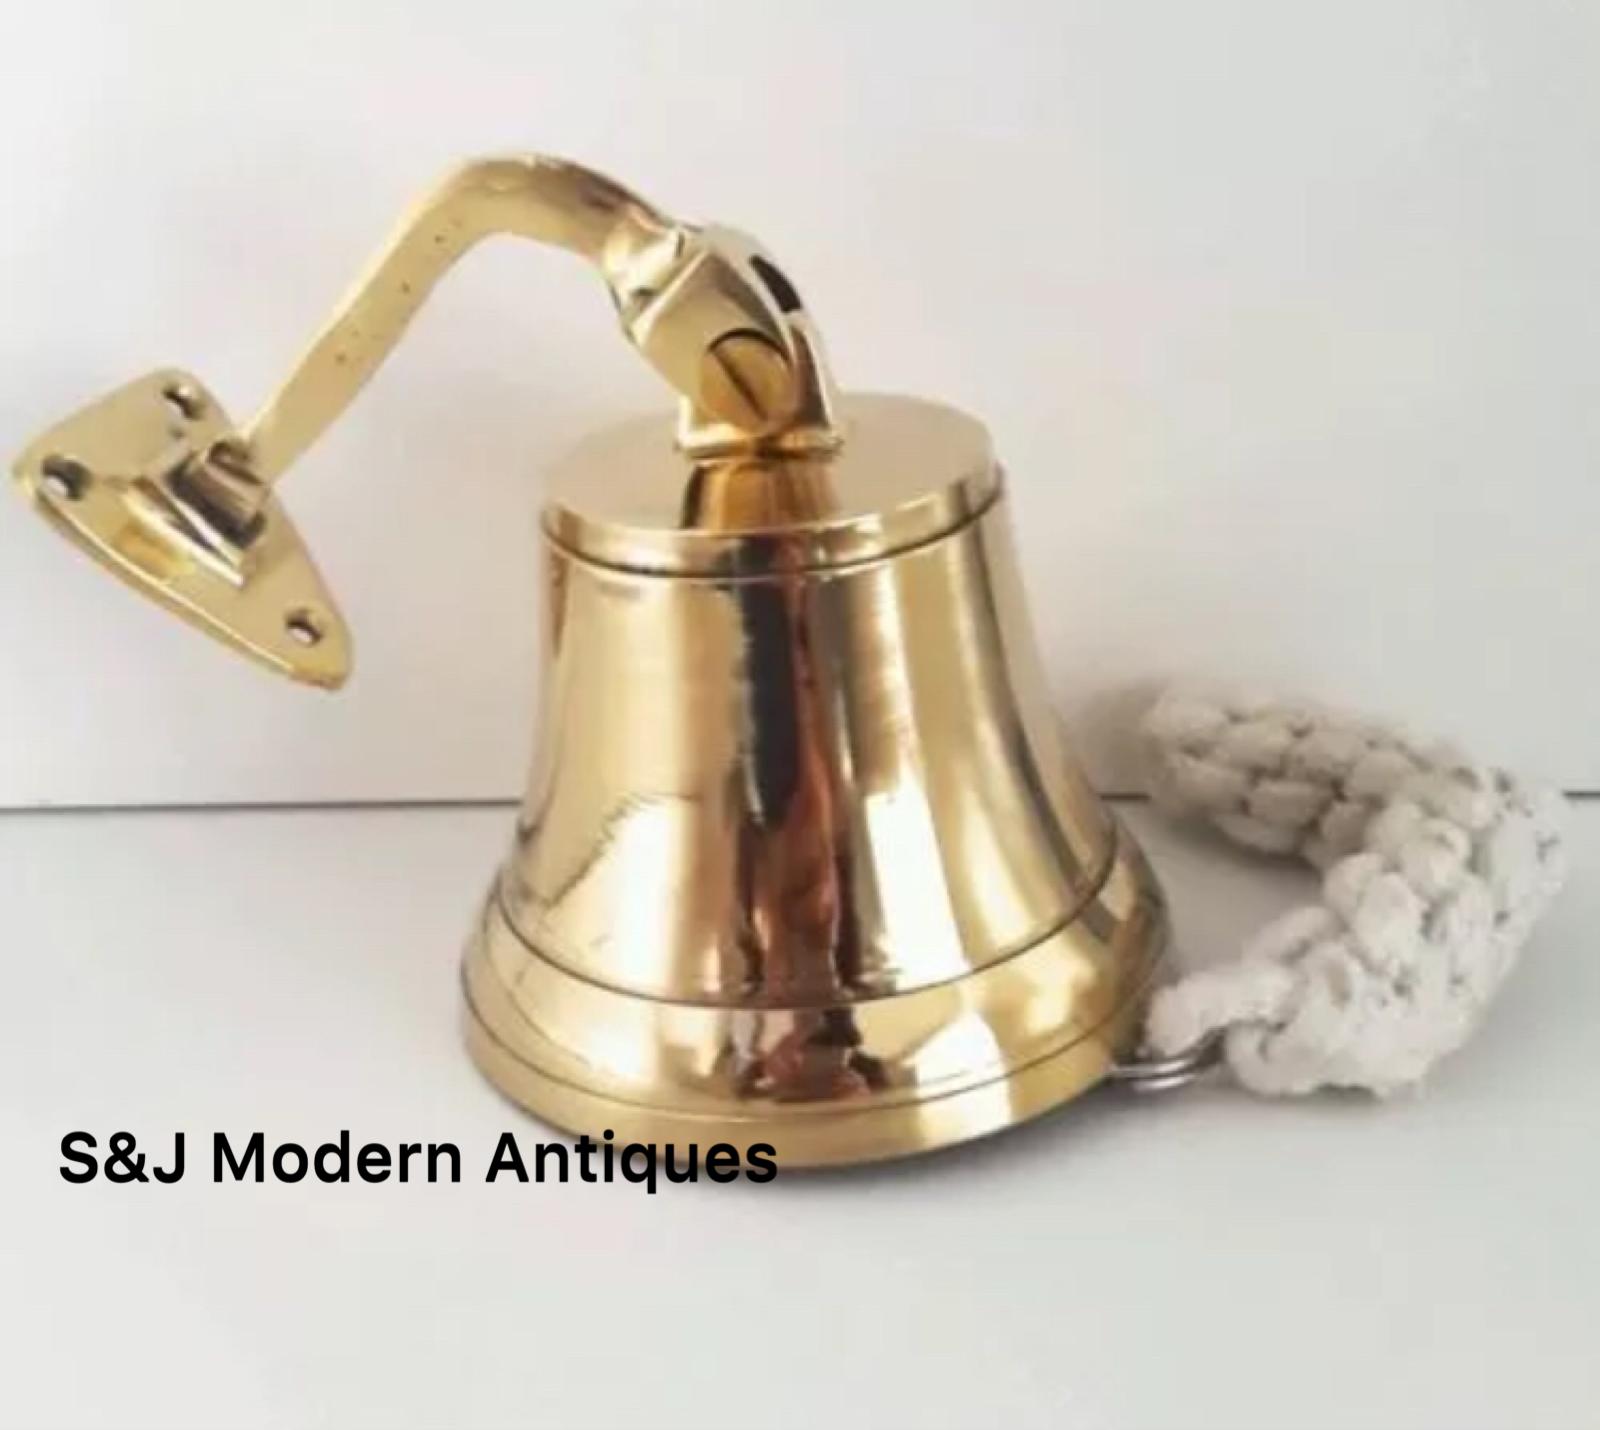 Antique Brass Wall Bell Vintage Ship's School Pub Last Orders Dinner Door 3 inch 6